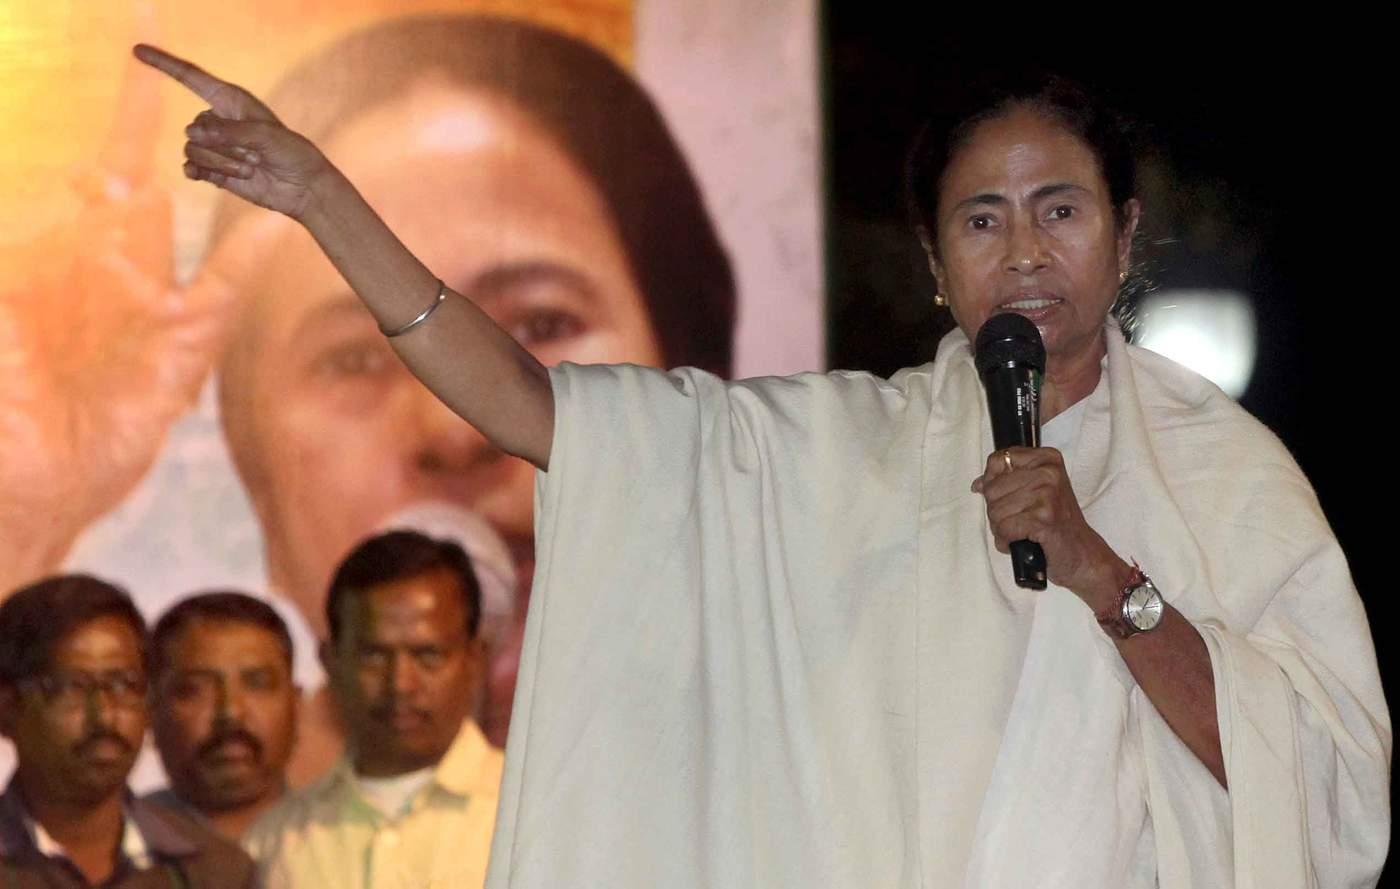 January 2017: Congress politician Mamata Banerjee addresses a protest against demonetisation in Kolkata